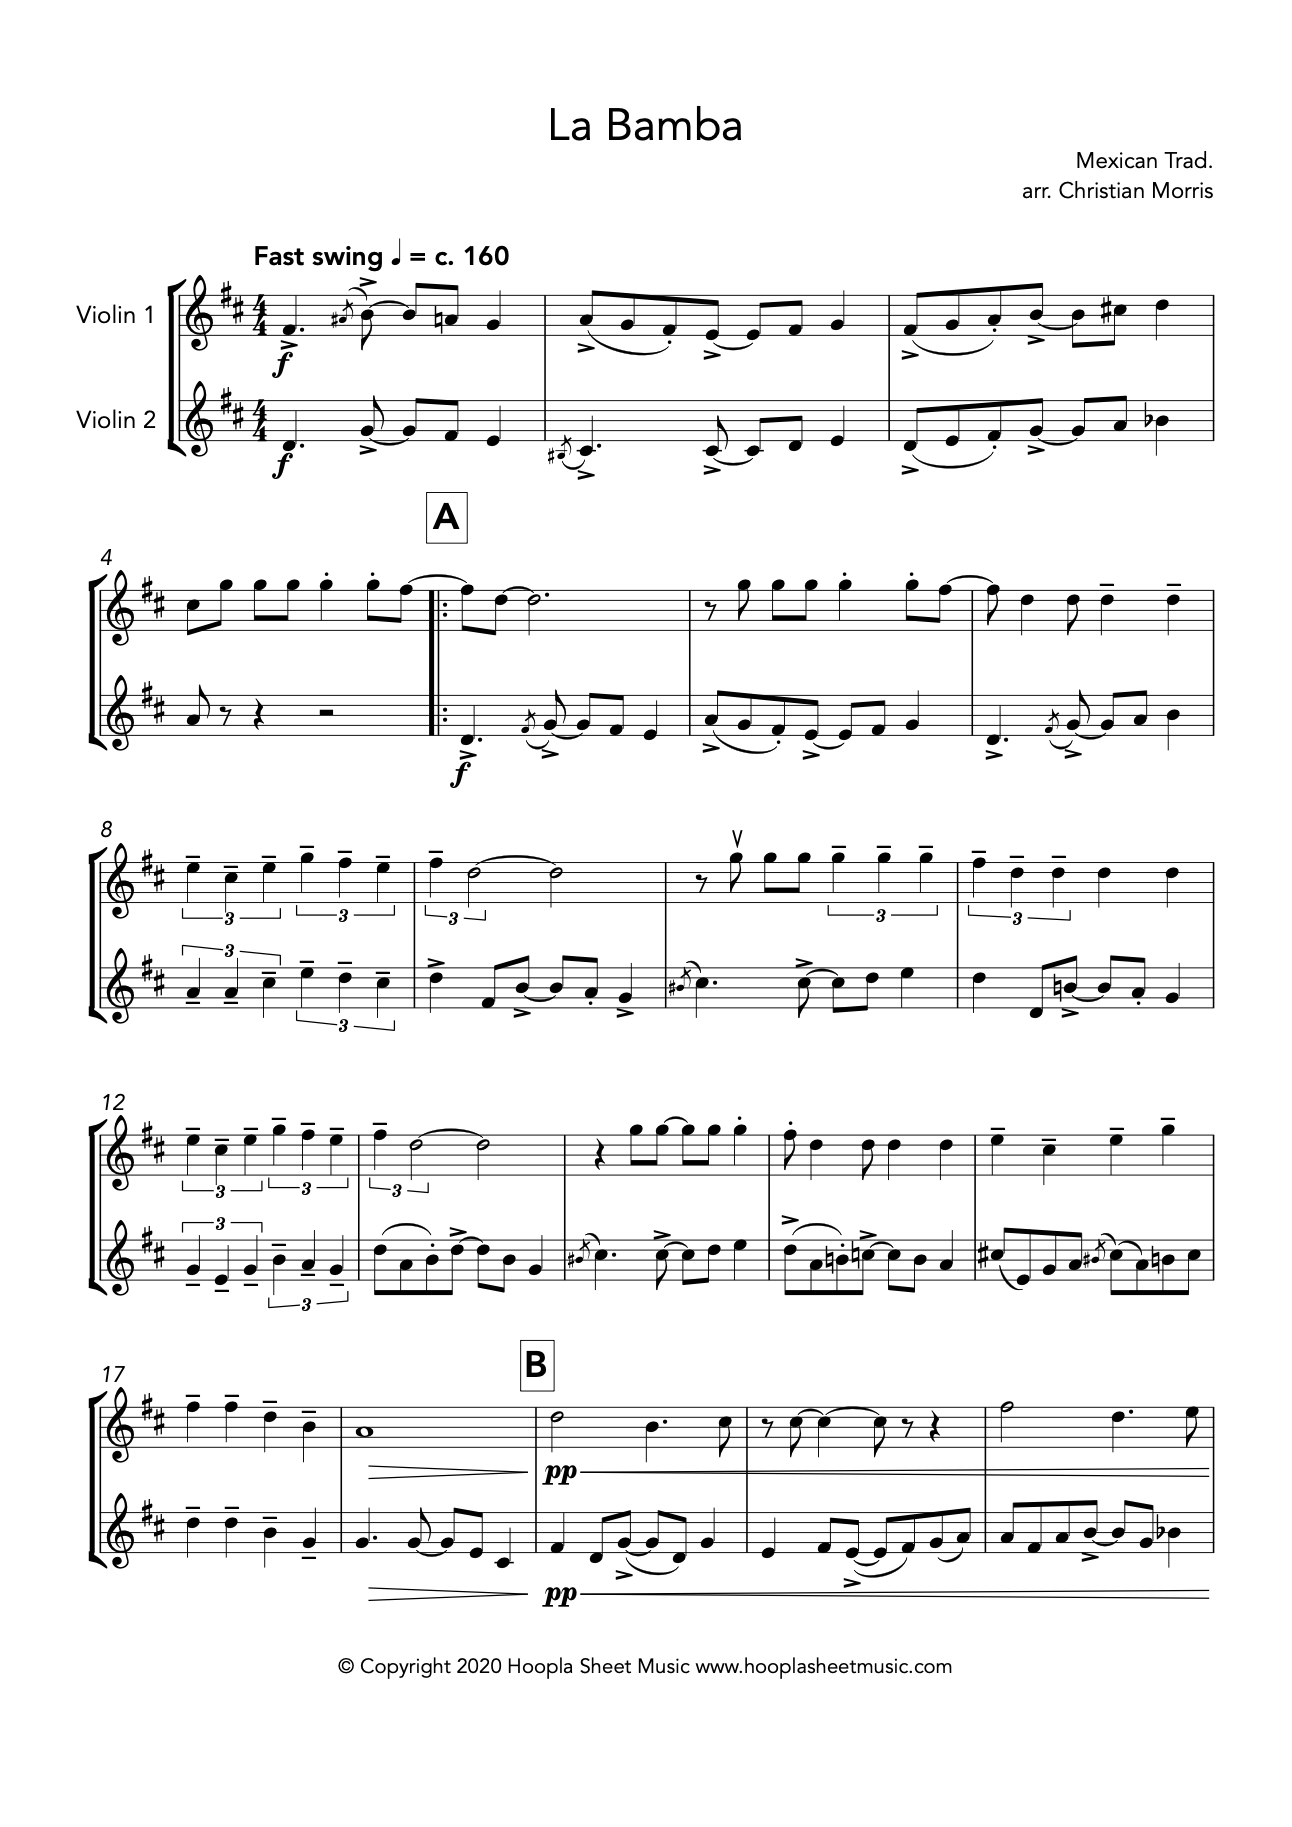 La Bamba (Violin Duet)